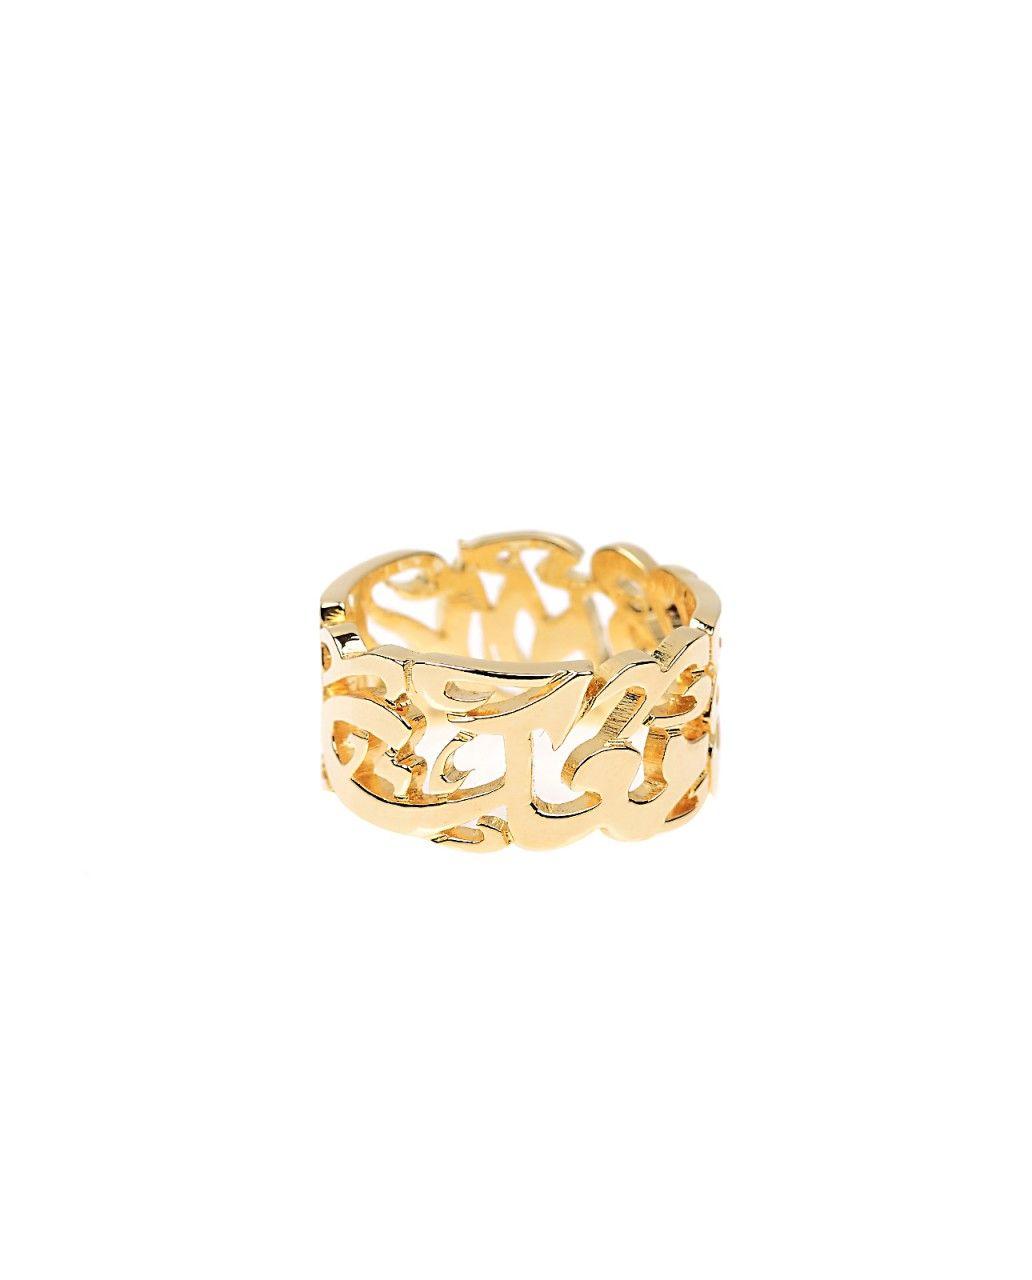 turkish wedding ring arabic calligraphy ring Arabic JewelryTurkish JewelryArab WeddingWedding